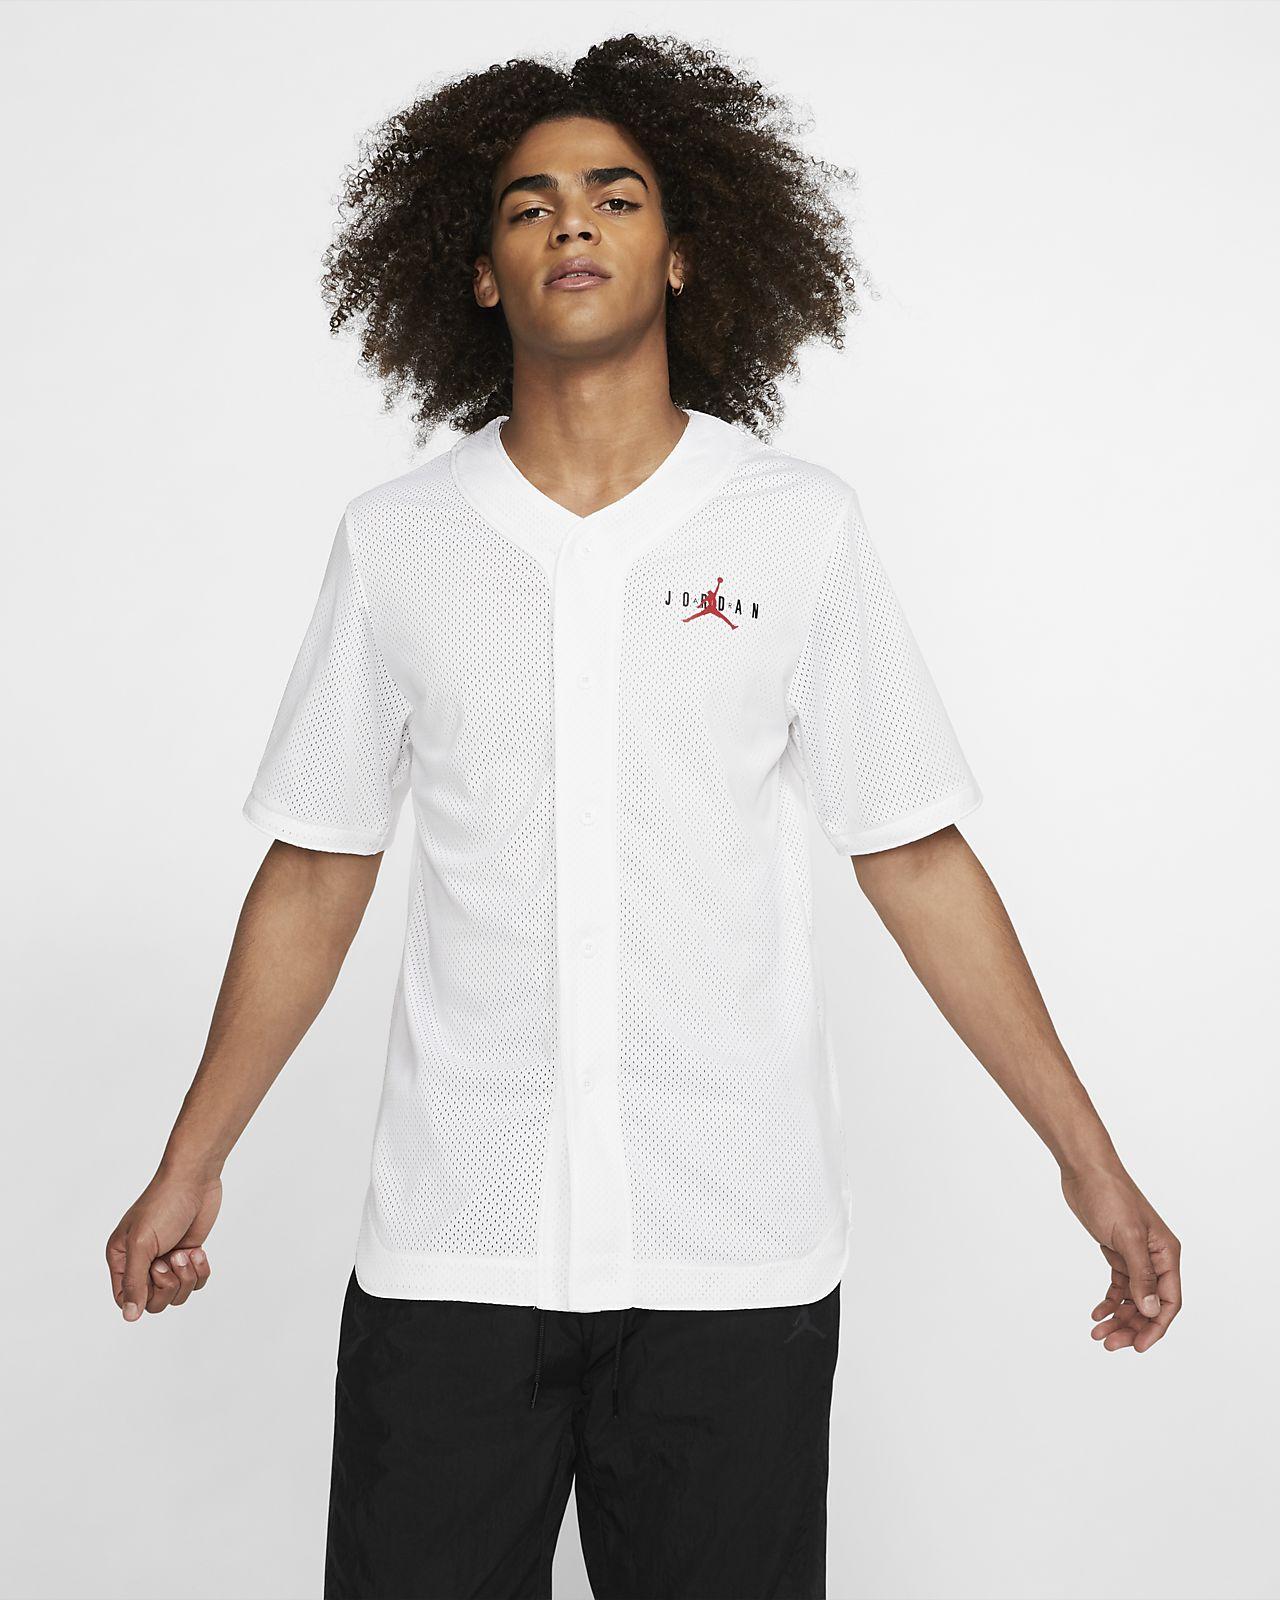 Camisola de malha Jordan Jumpman Air para homem